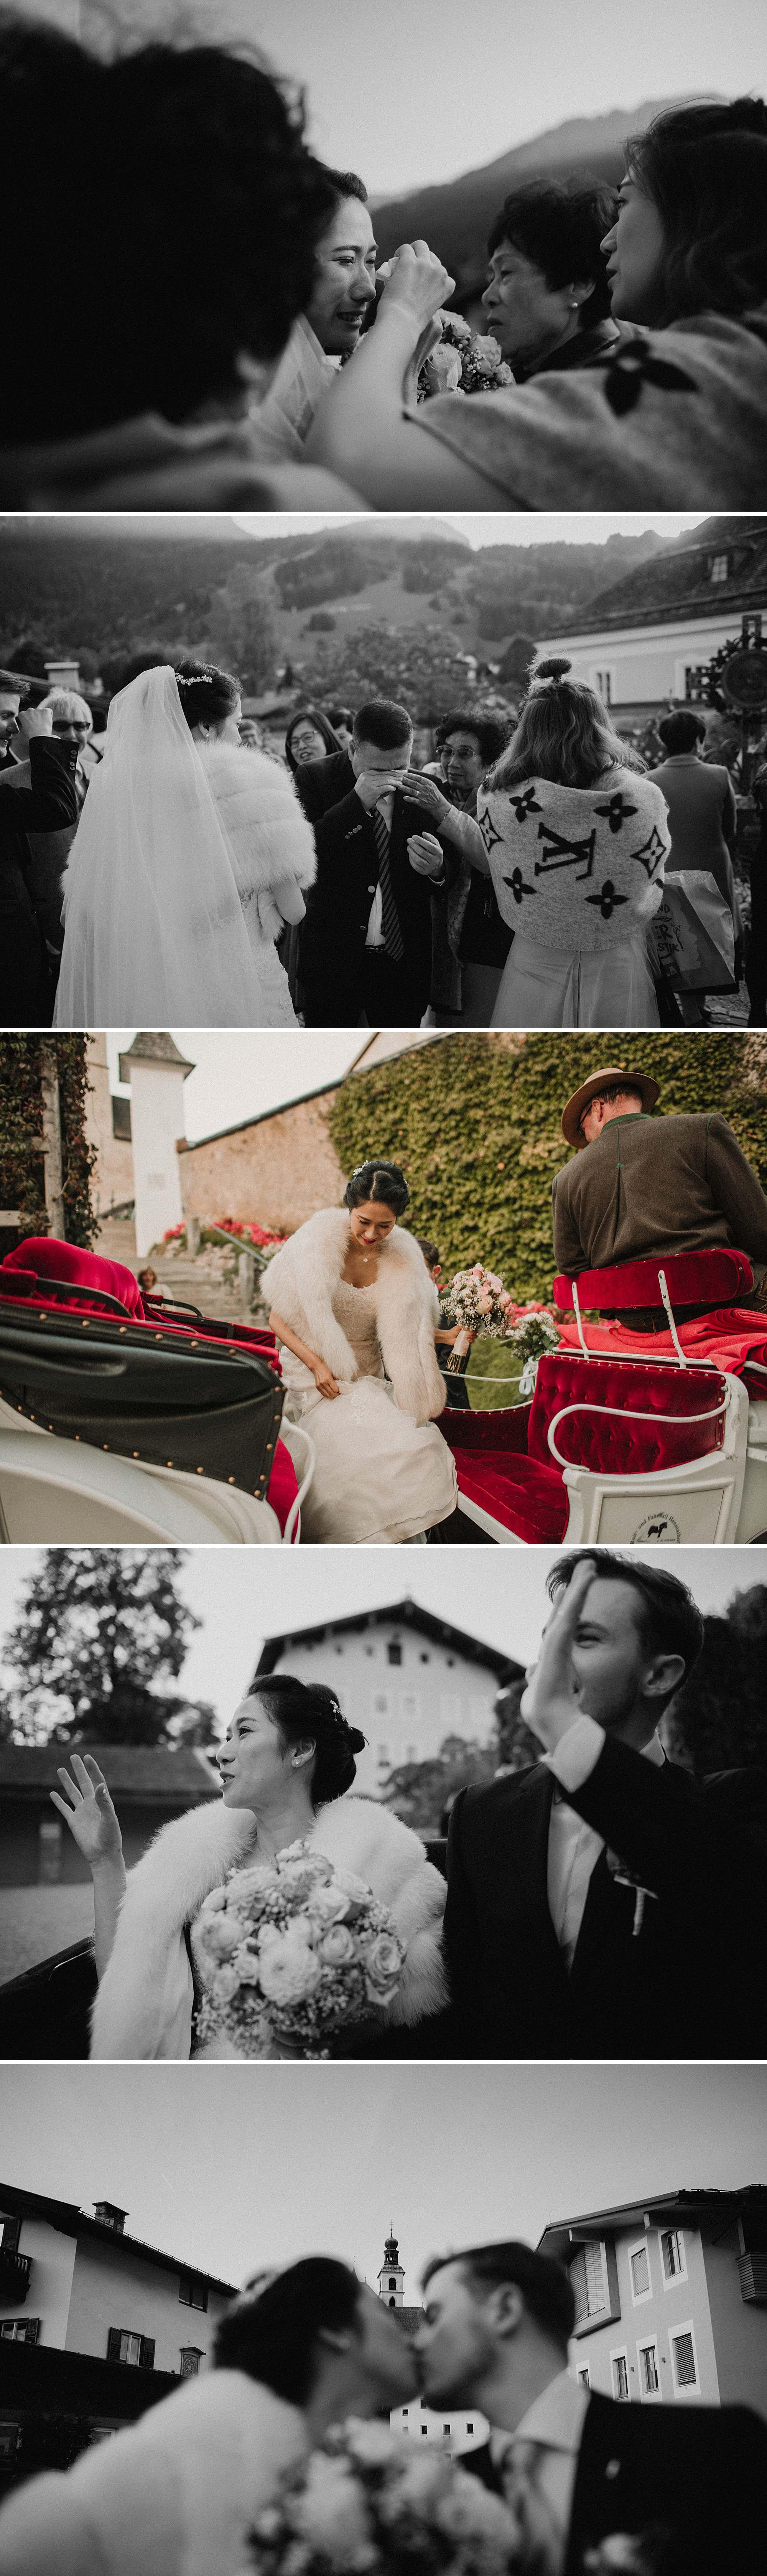 kitzbuehel wedding photographer_0097.jpg